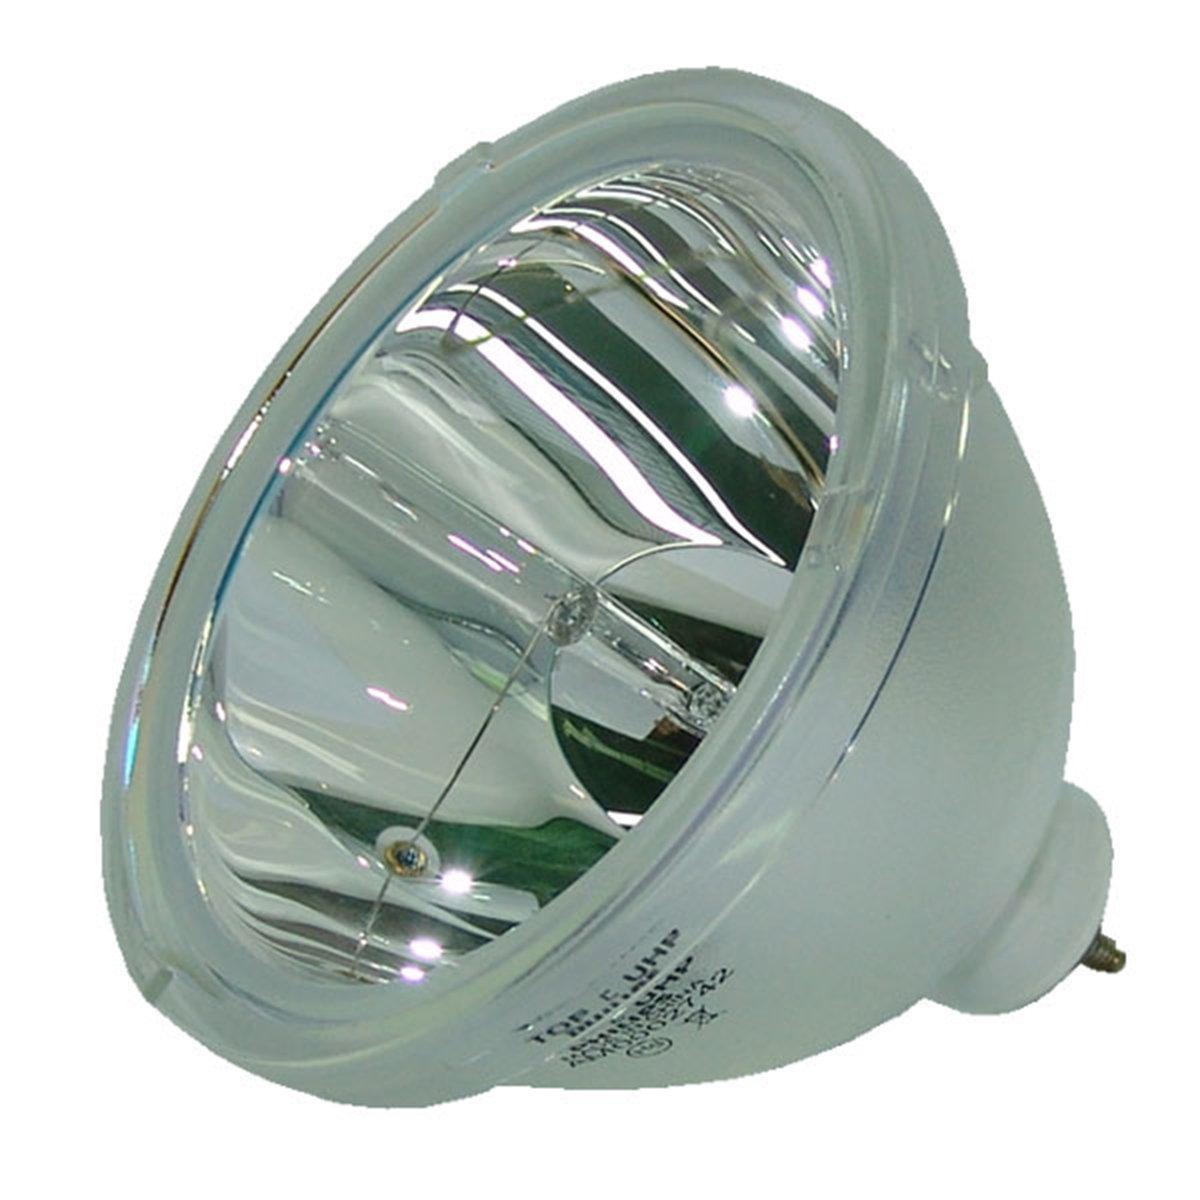 SpArc 交換用ランプ 囲い/電球付き Zenith 6912B22007A用 Platinum (Brighter/Durable) B07MPTC18S Lamp Only Platinum (Brighter/Durable)